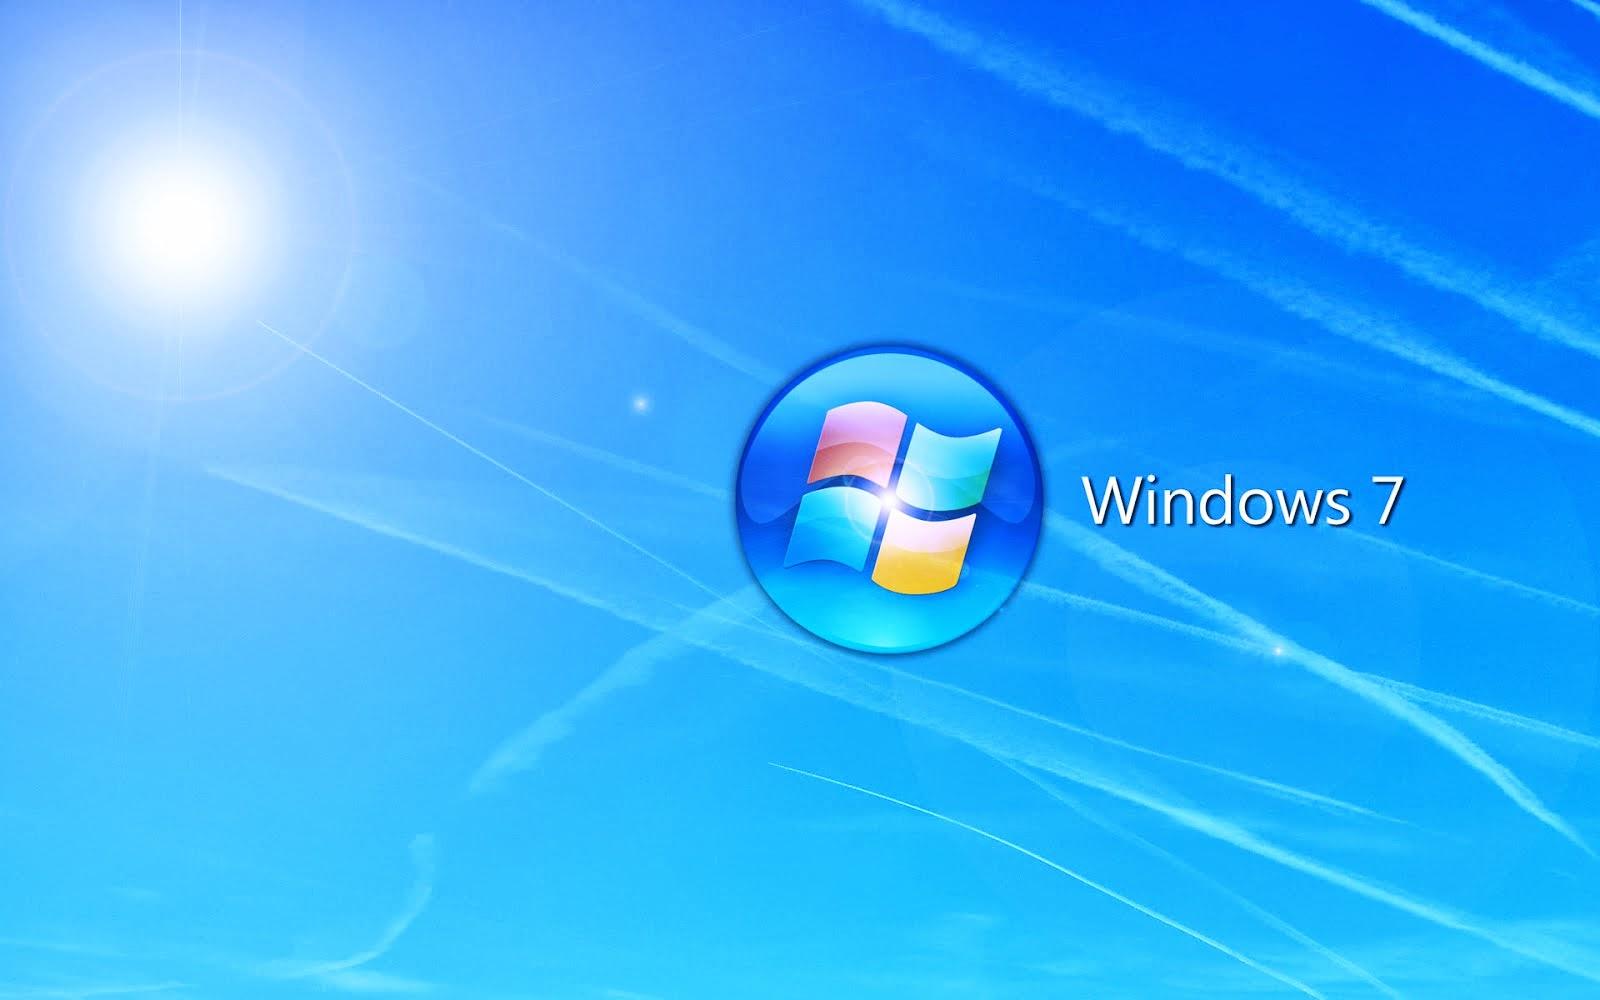 Wallpaper Animated Windows 7 Wallpaper Animated 1600x1000